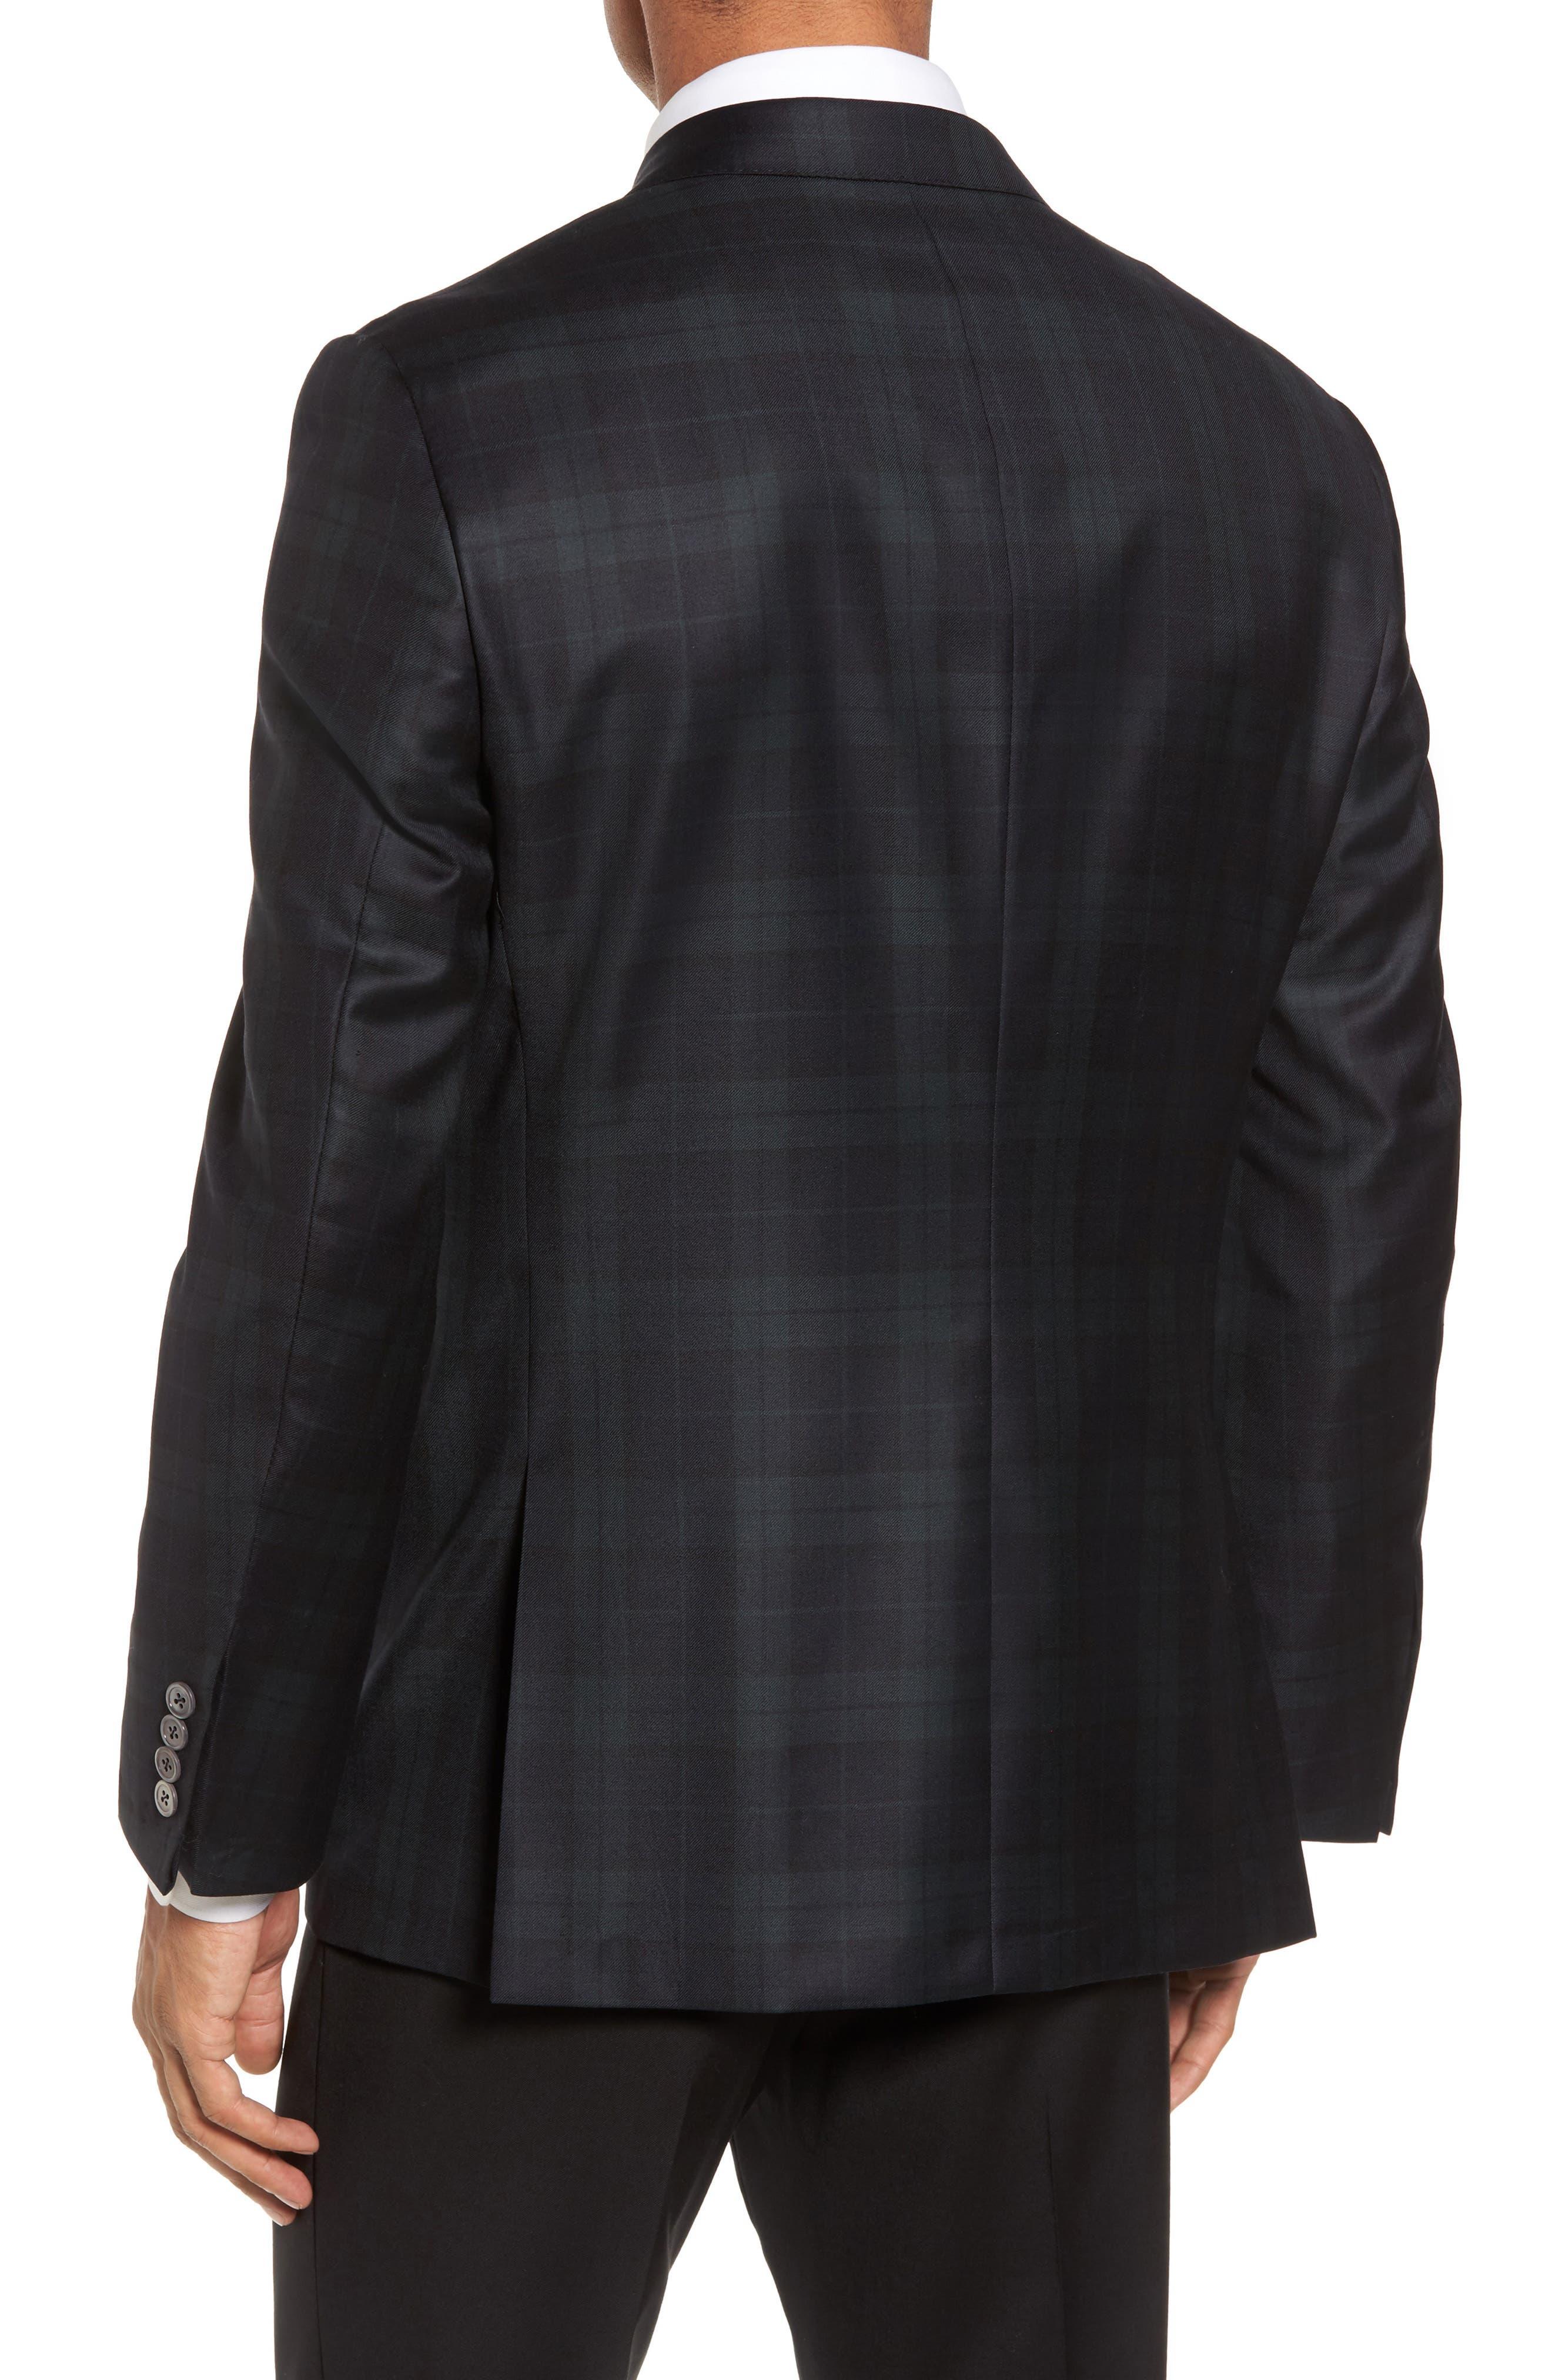 Alternate Image 2  - Hickey Freeman Classic B Fit Plaid Wool Dinner Jacket